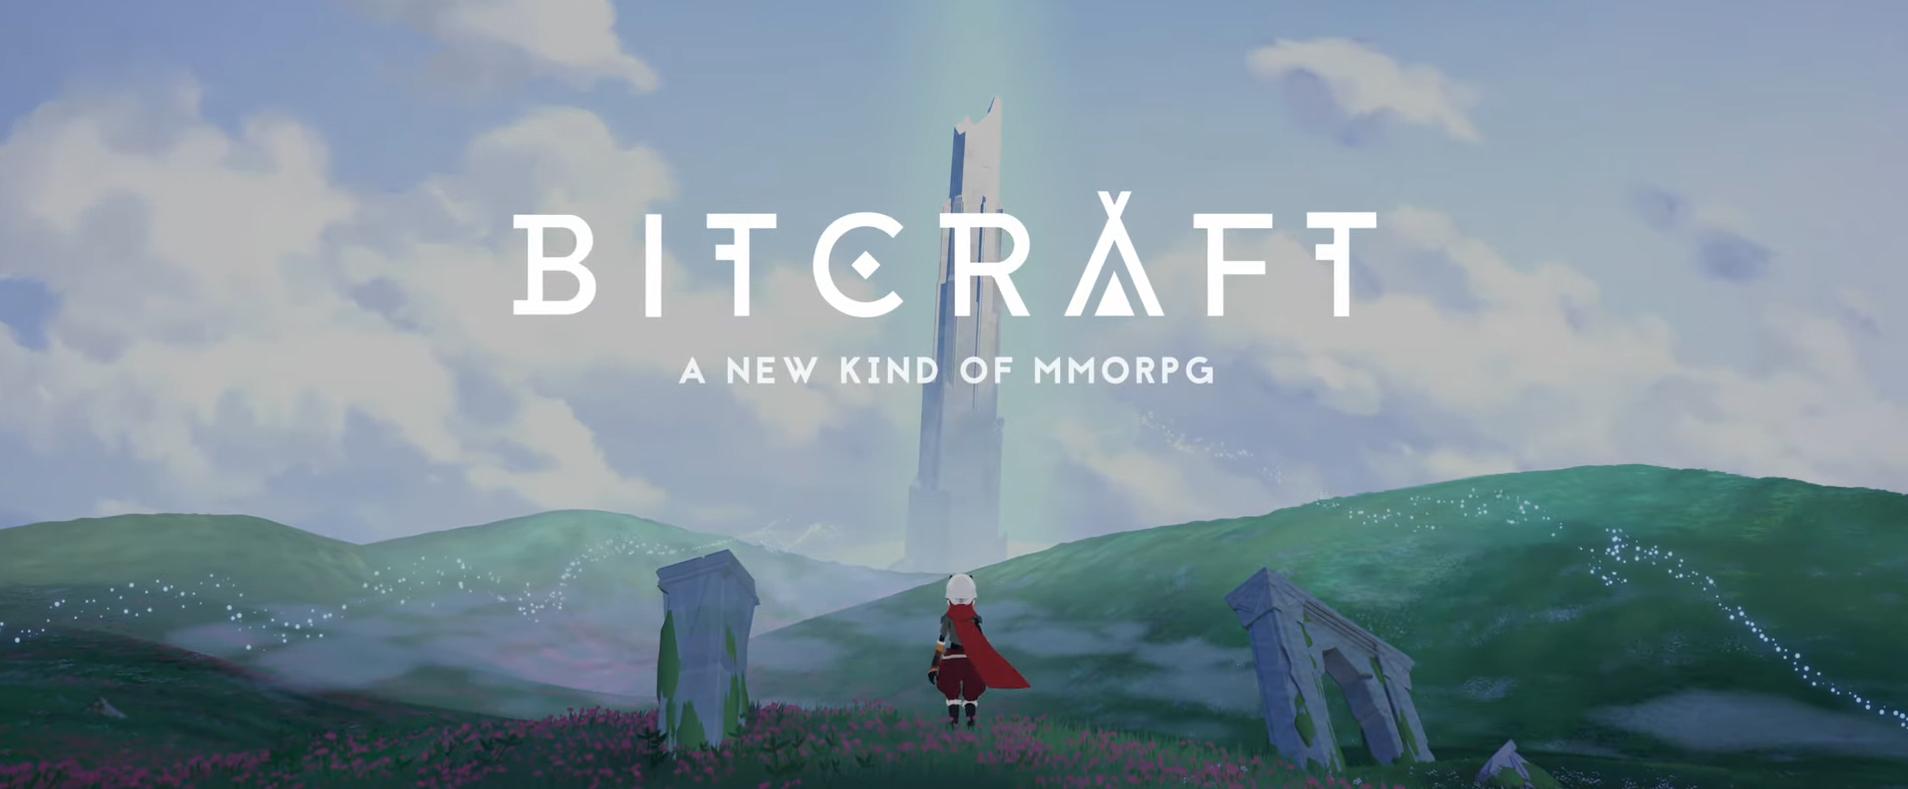 BitCraft Release Official Announcement Trailer